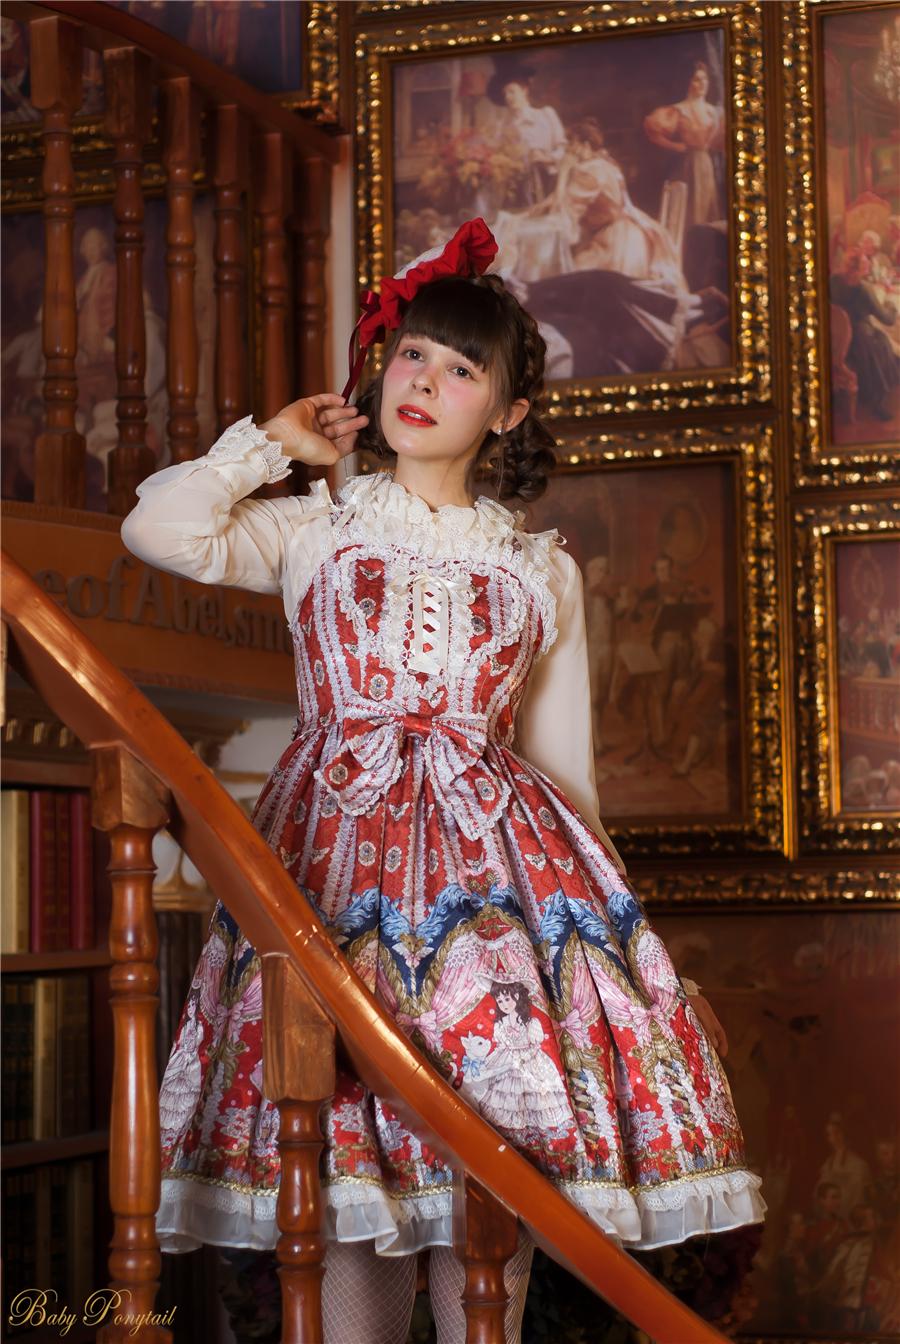 BabyPonytail_Model photo_My Favorite Companion_Red JSK-2_Claudia_1.jpg